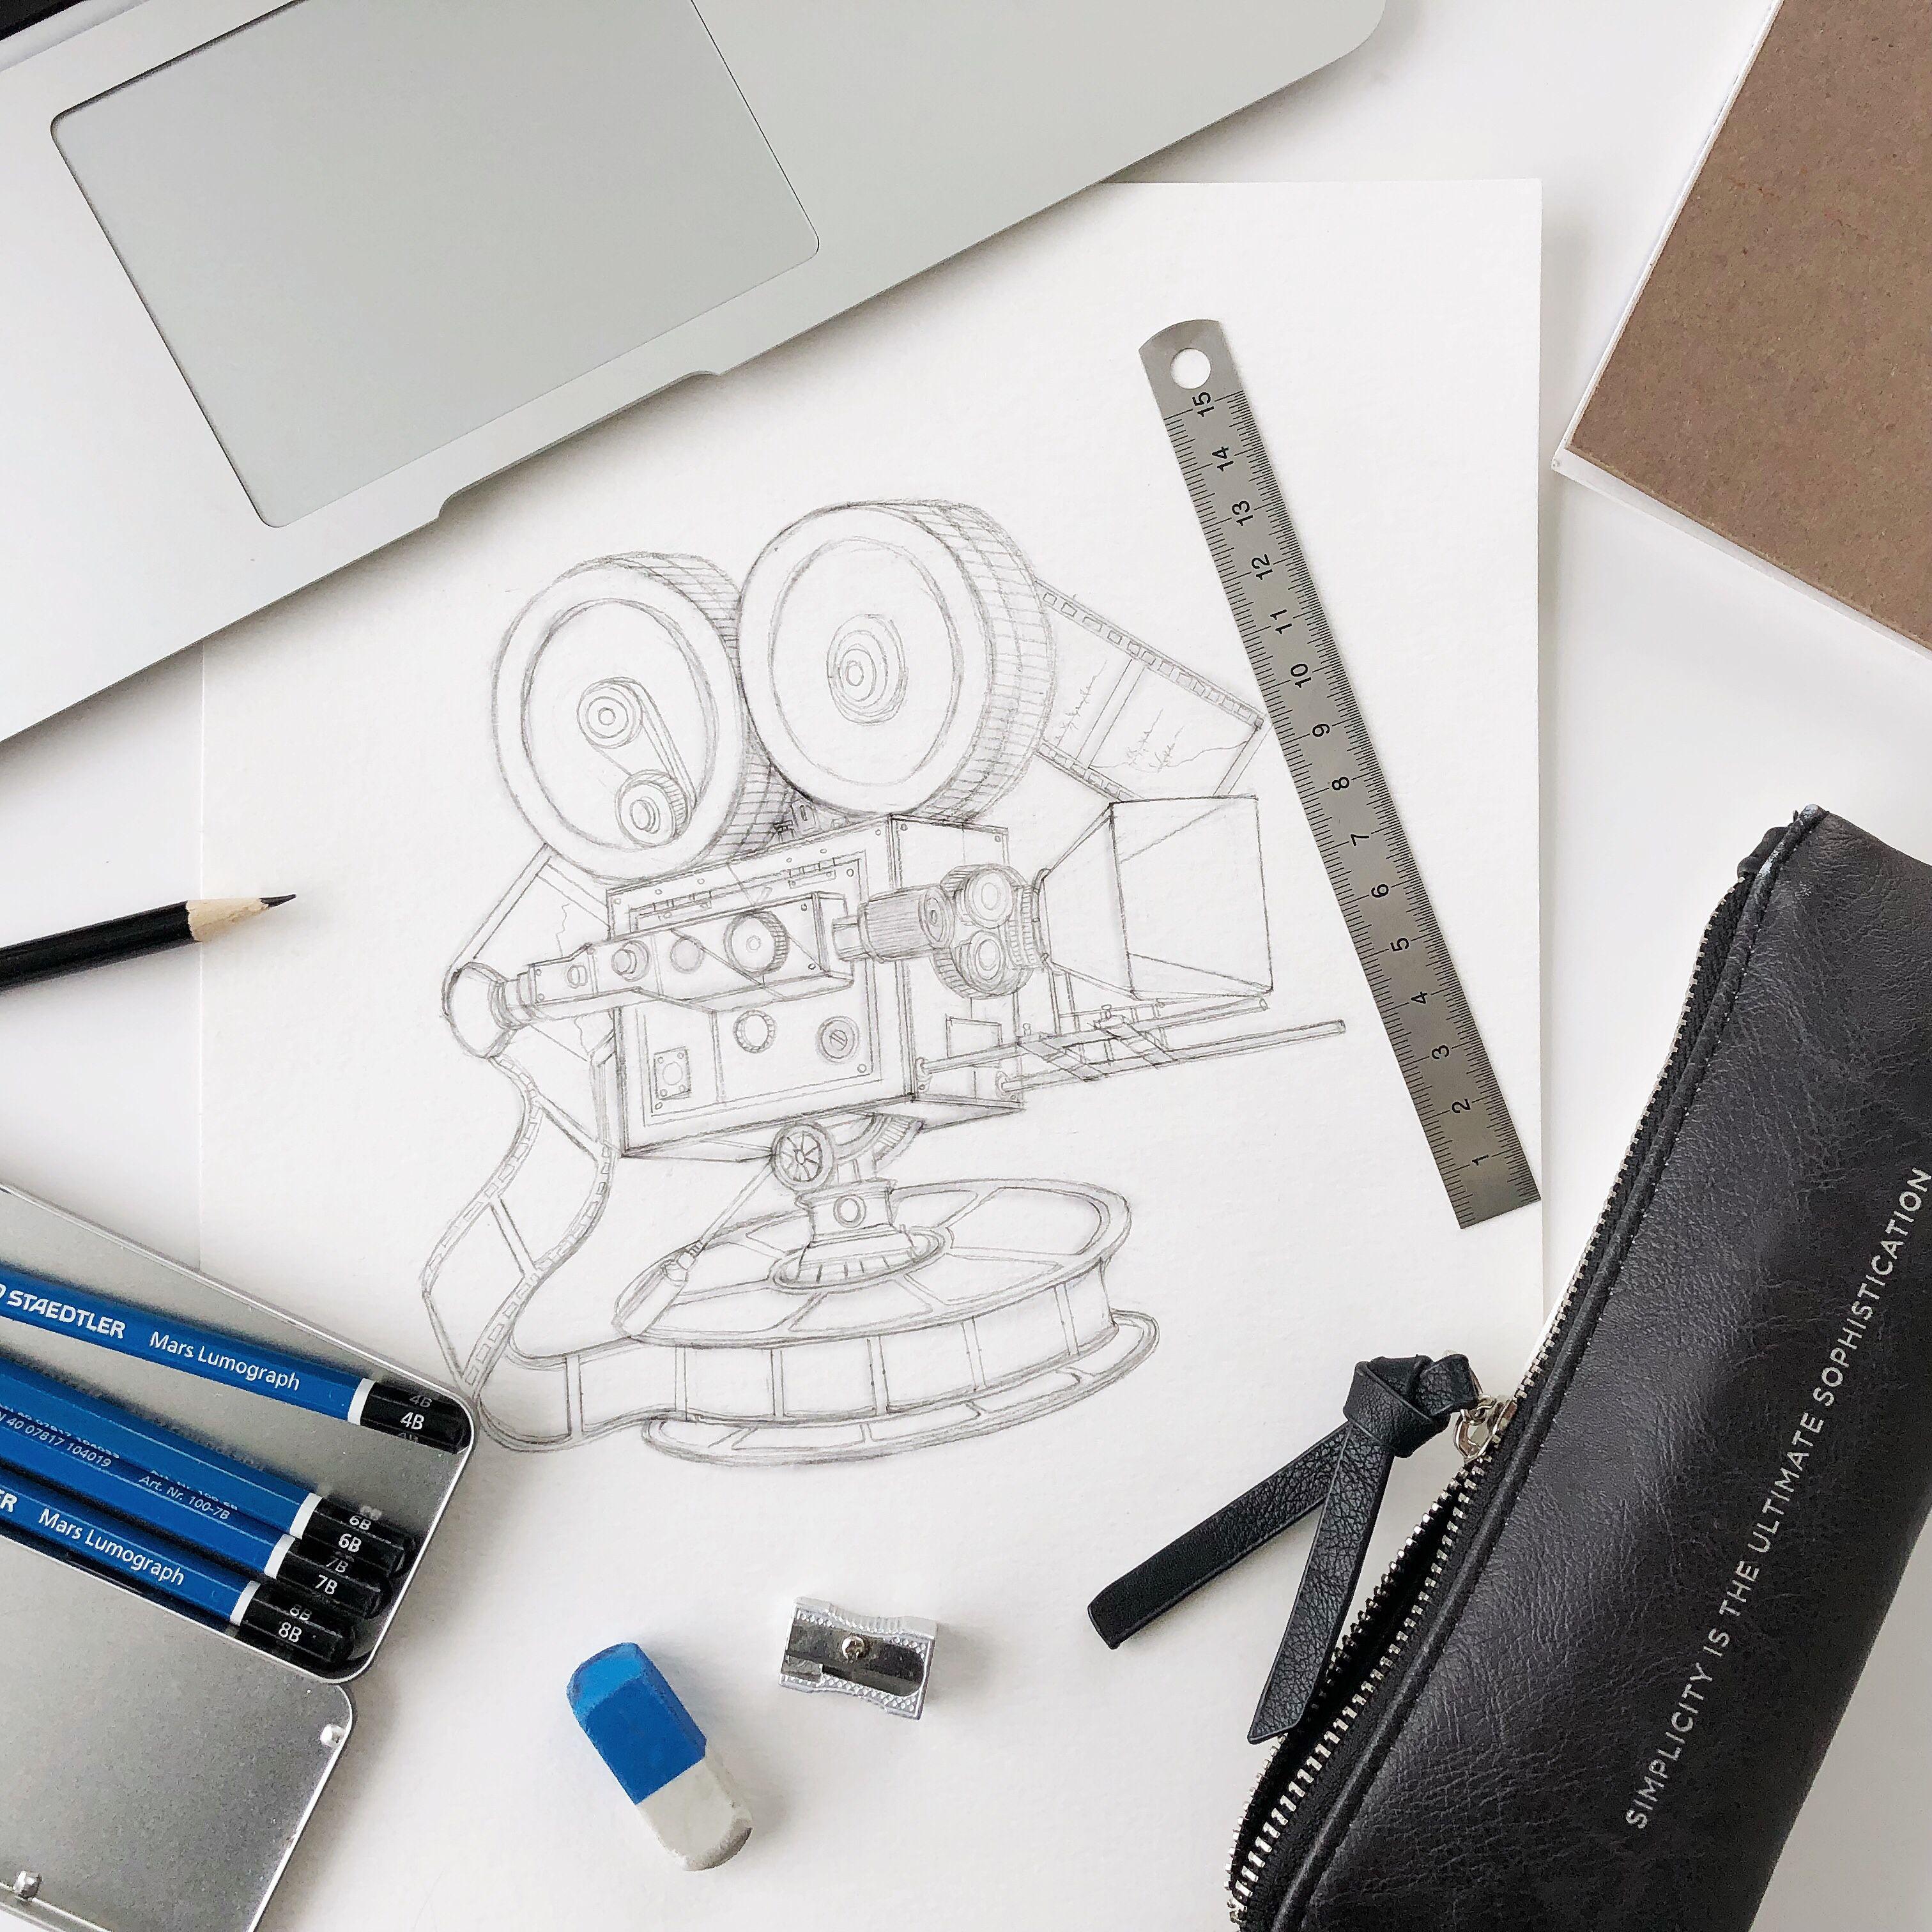 Vintage film camera watercolor pencil sketch sketchbook illustrator artwork sketchaday sketchbookart drawing art artist penandink inkart penart